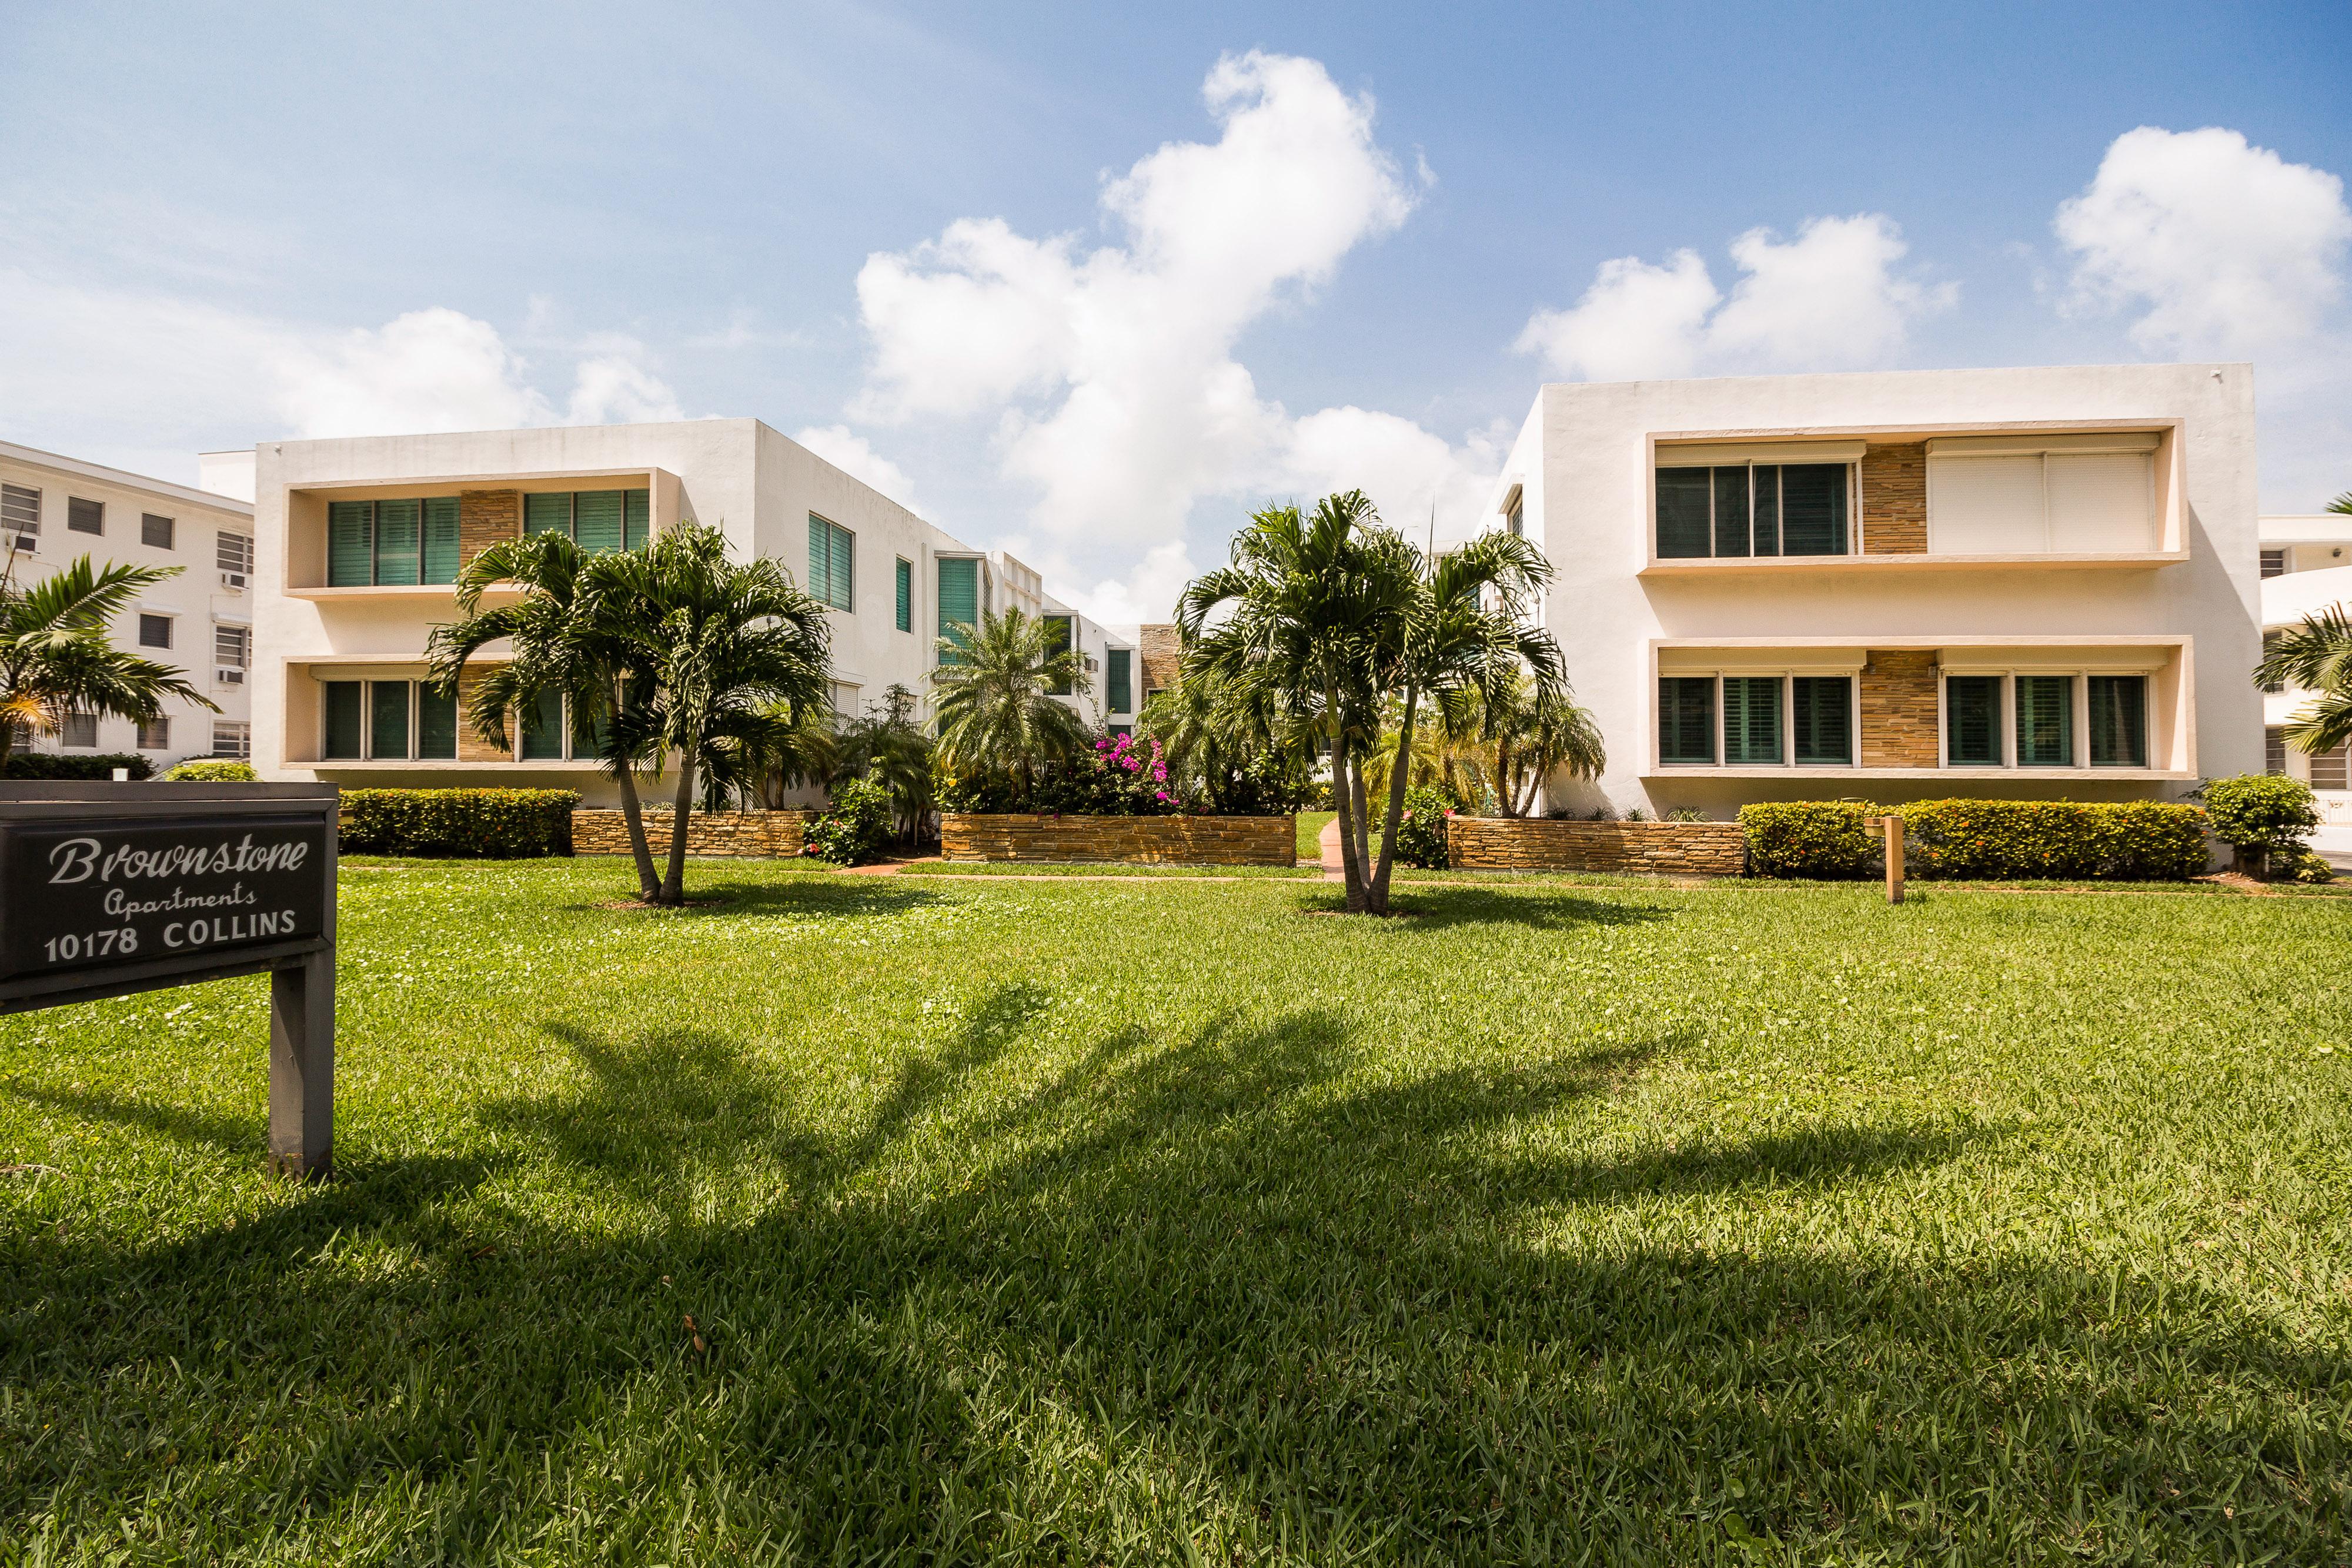 共有公寓 為 出售 在 10178 Collins Ave #210 10178 Collins Ave 210 Bal Harbour, 佛羅里達州, 33154 美國